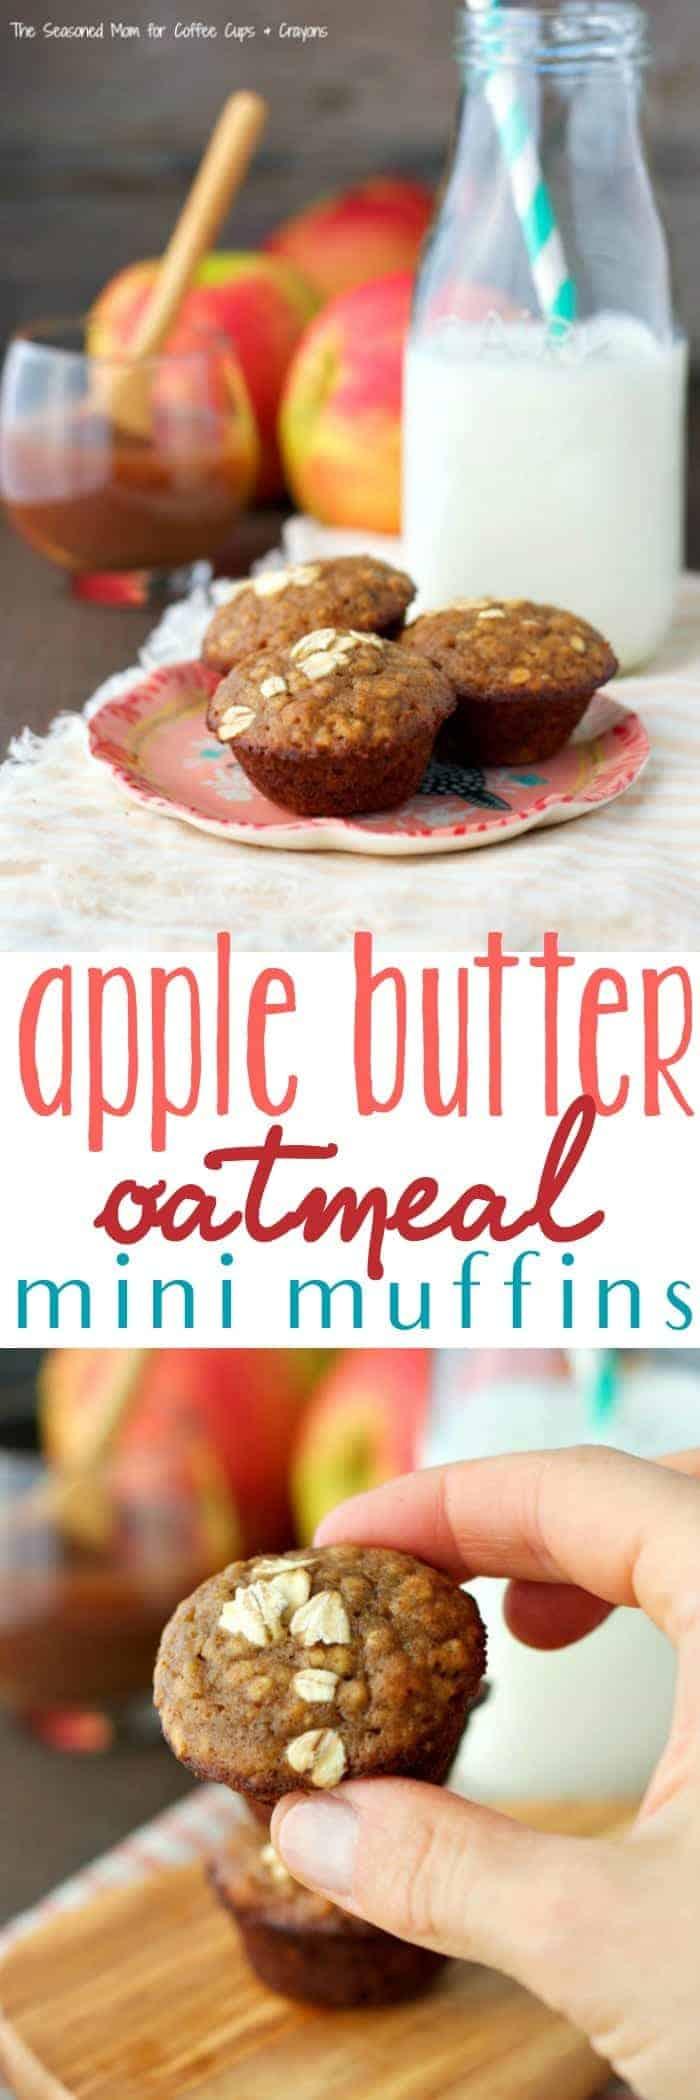 Apple Butter Oatmeal Muffins